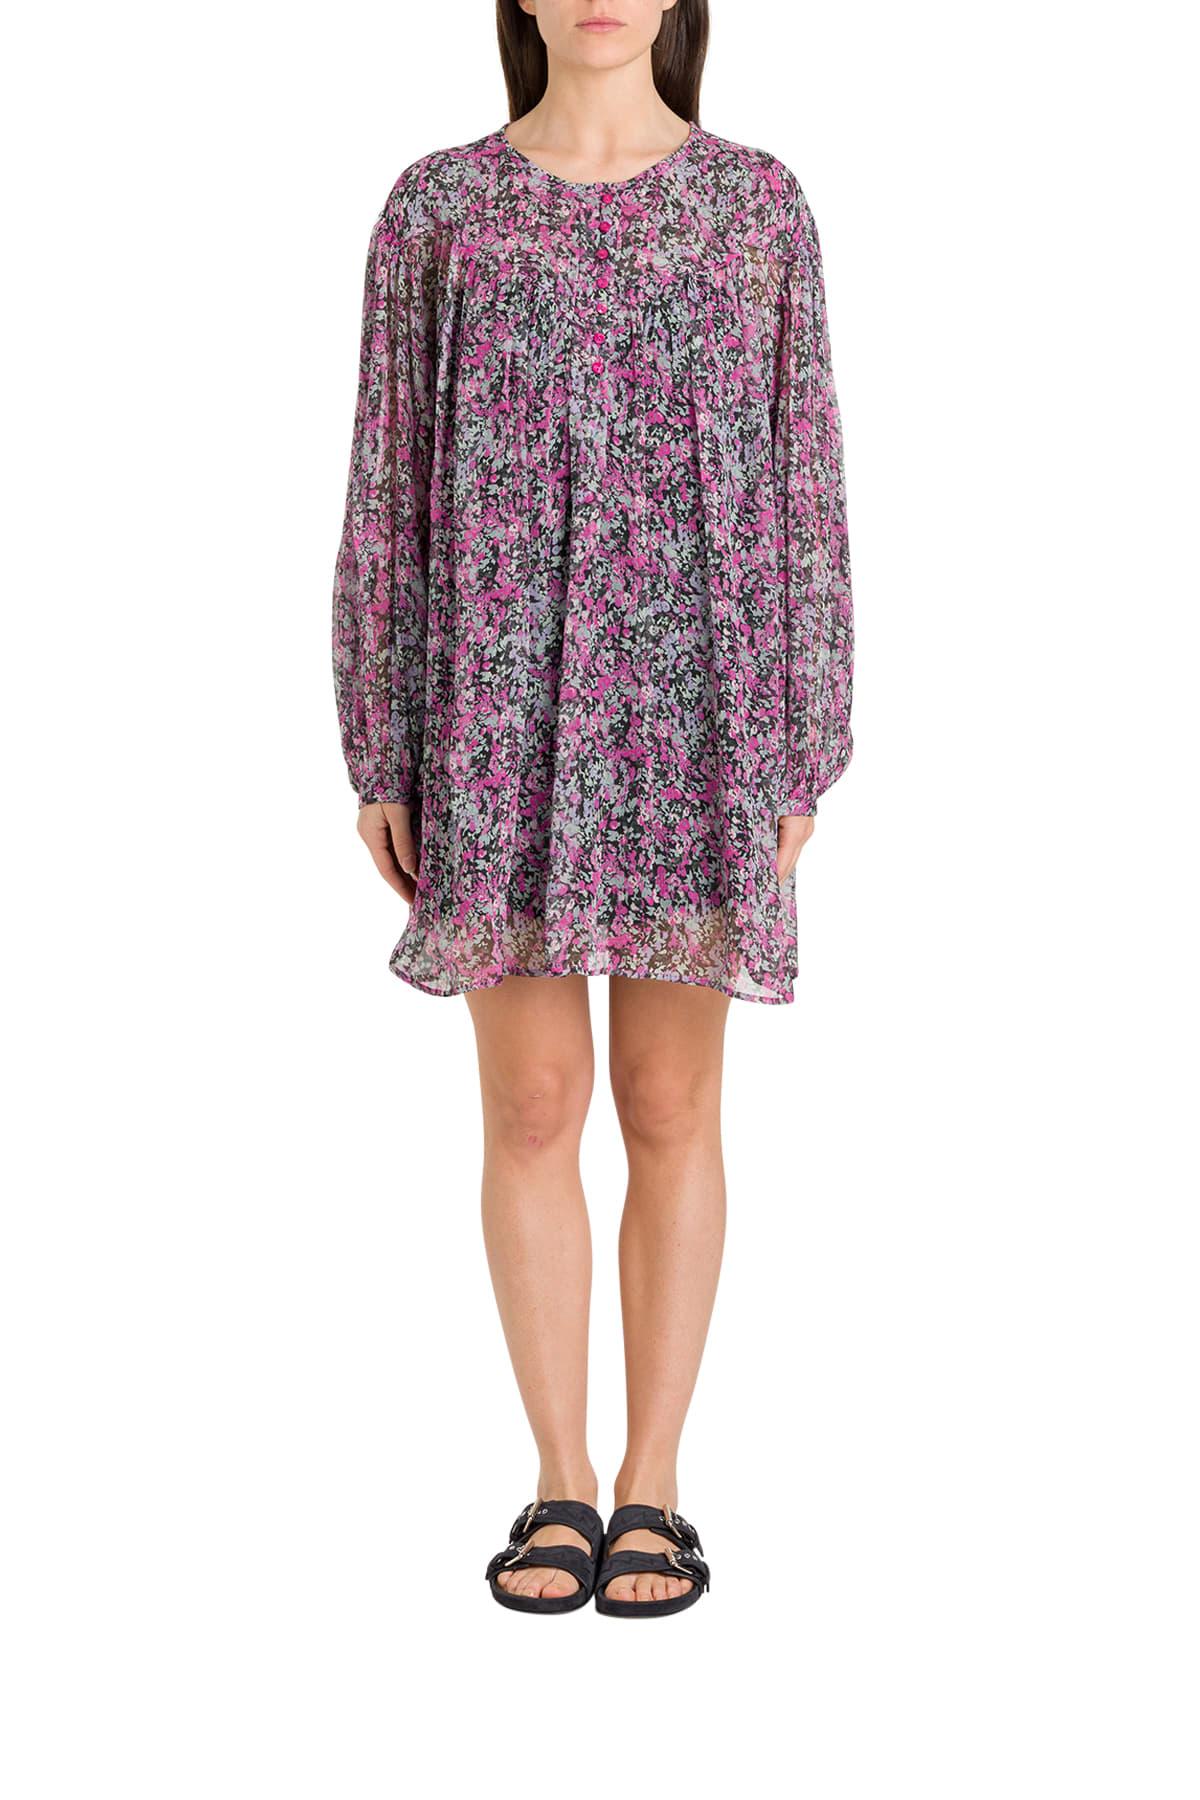 Buy Isabel Marant Orion Short Dress online, shop Isabel Marant with free shipping